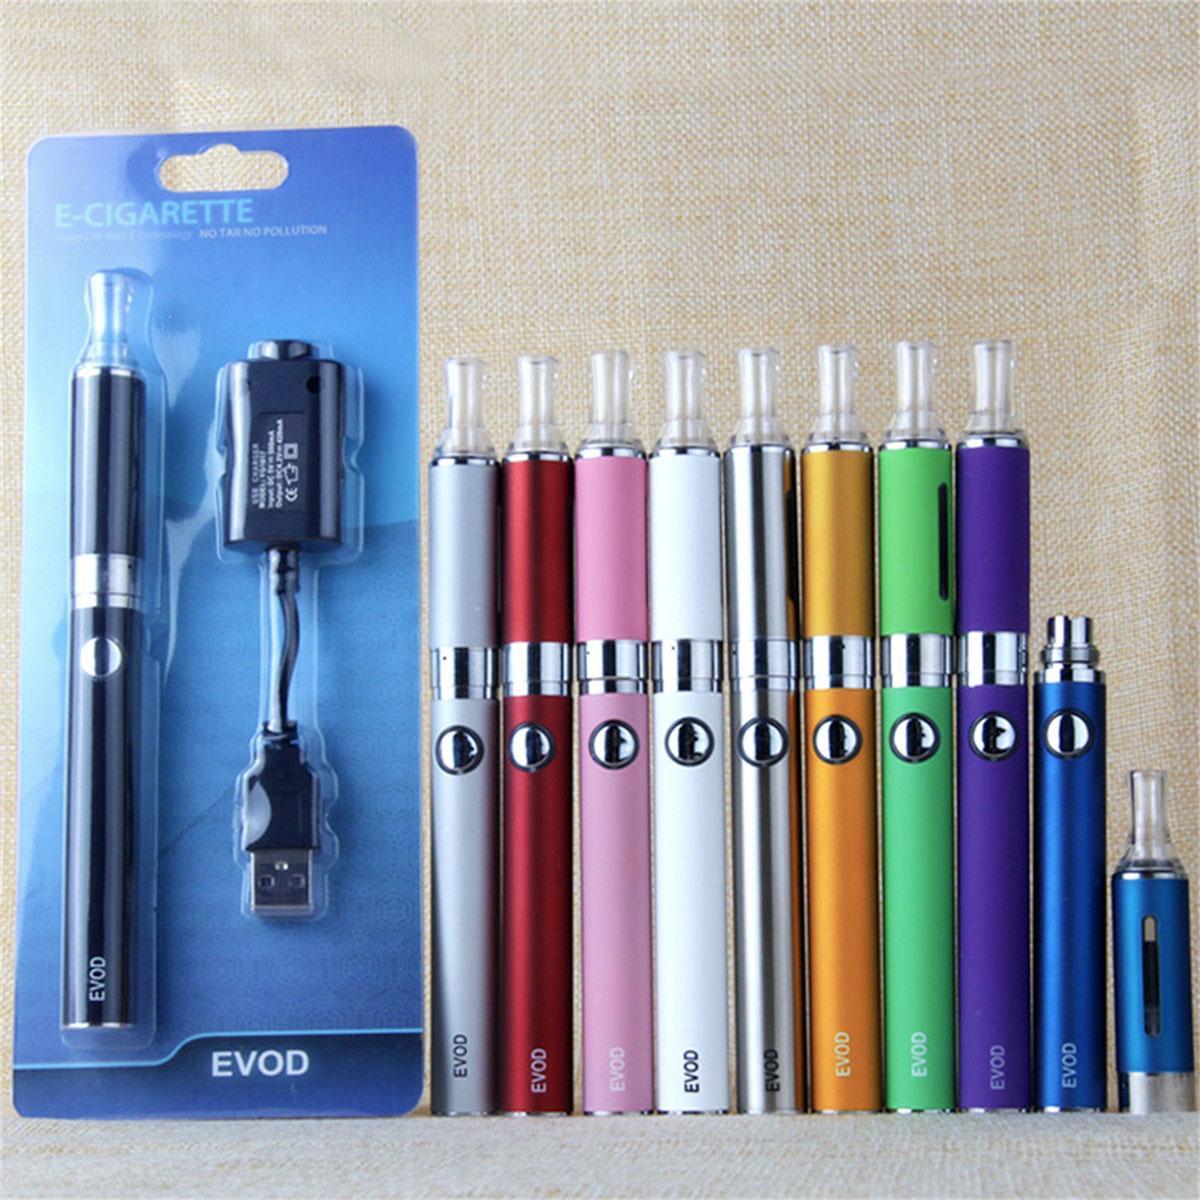 MT3 EVOD Starter Kit BCC E-Cig kits Electronic Cigarette Blister Package with EVOD battery 650mAh 900mAh 1100mAh